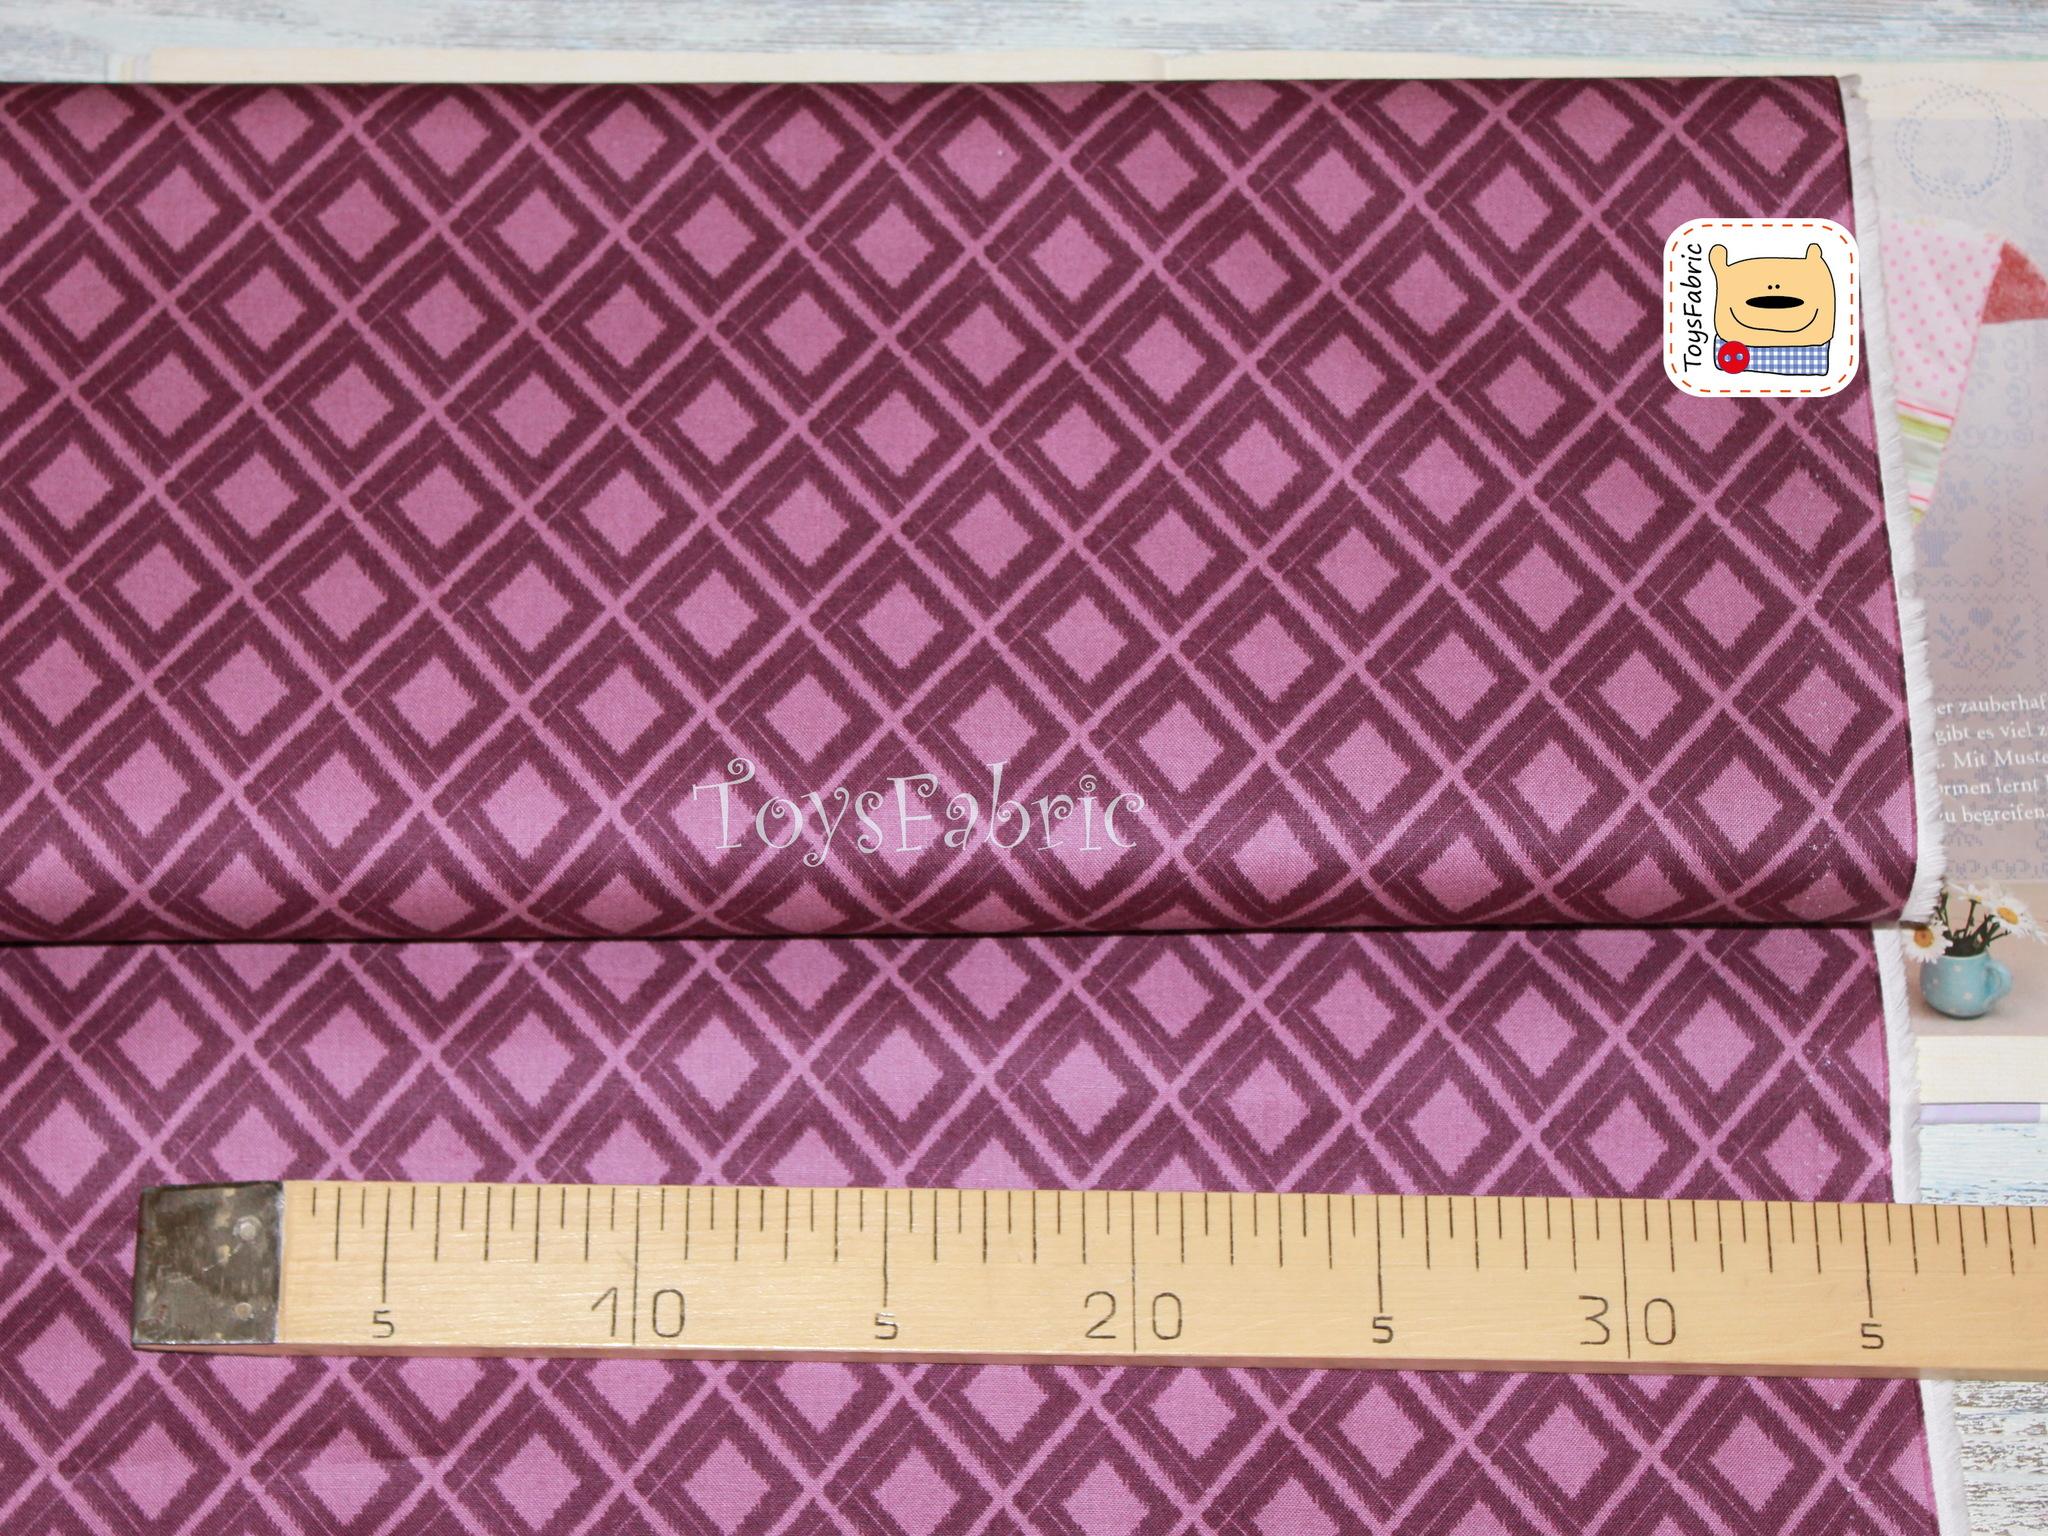 Ткань для пэчворка 20620 (ромбы на фиолетовом) 45х55см